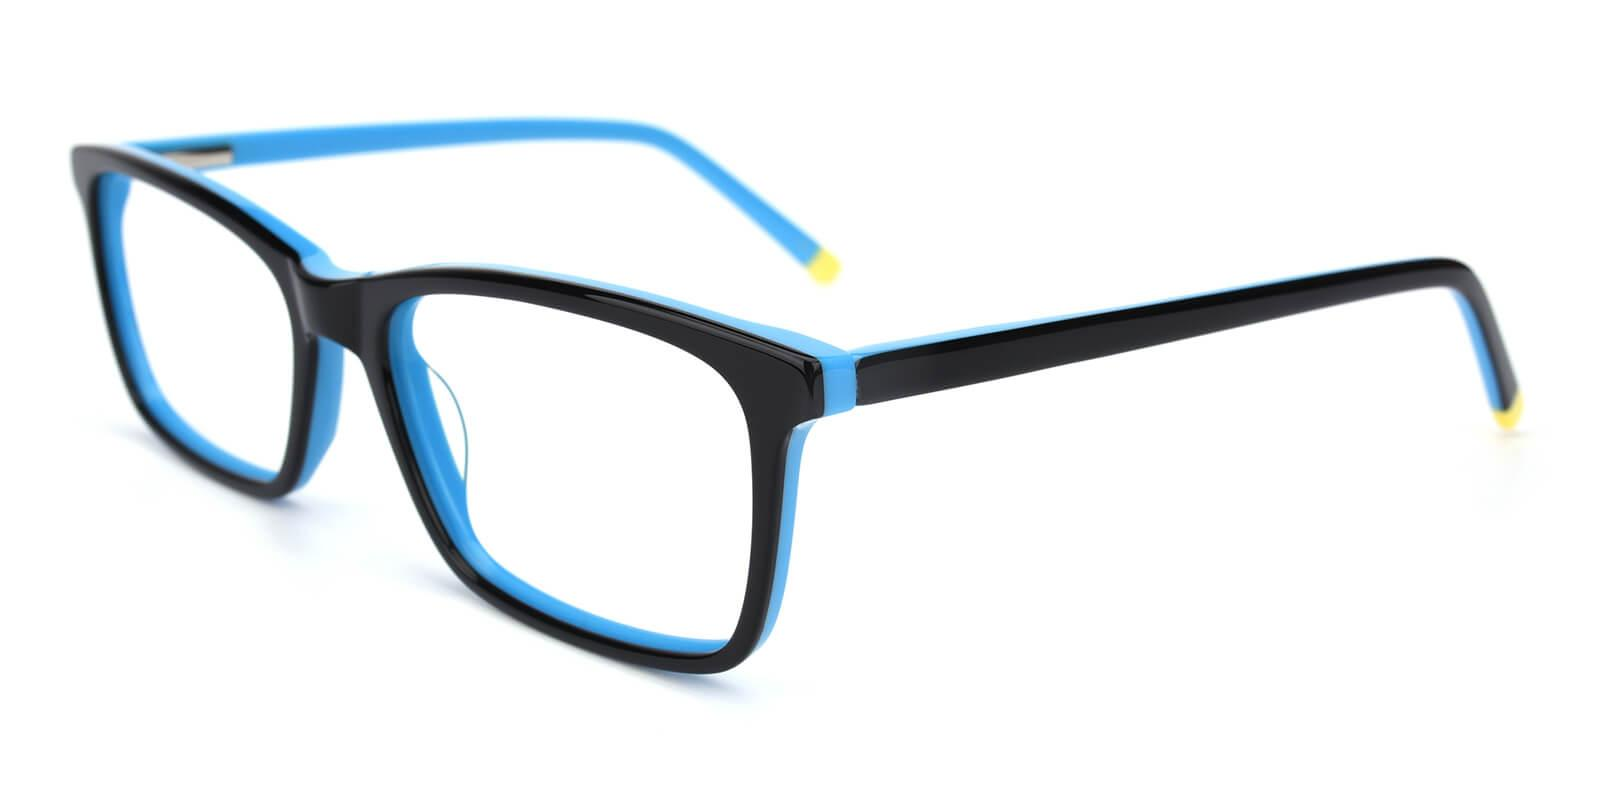 Crane-Blue-Rectangle-Acetate-Eyeglasses-additional1